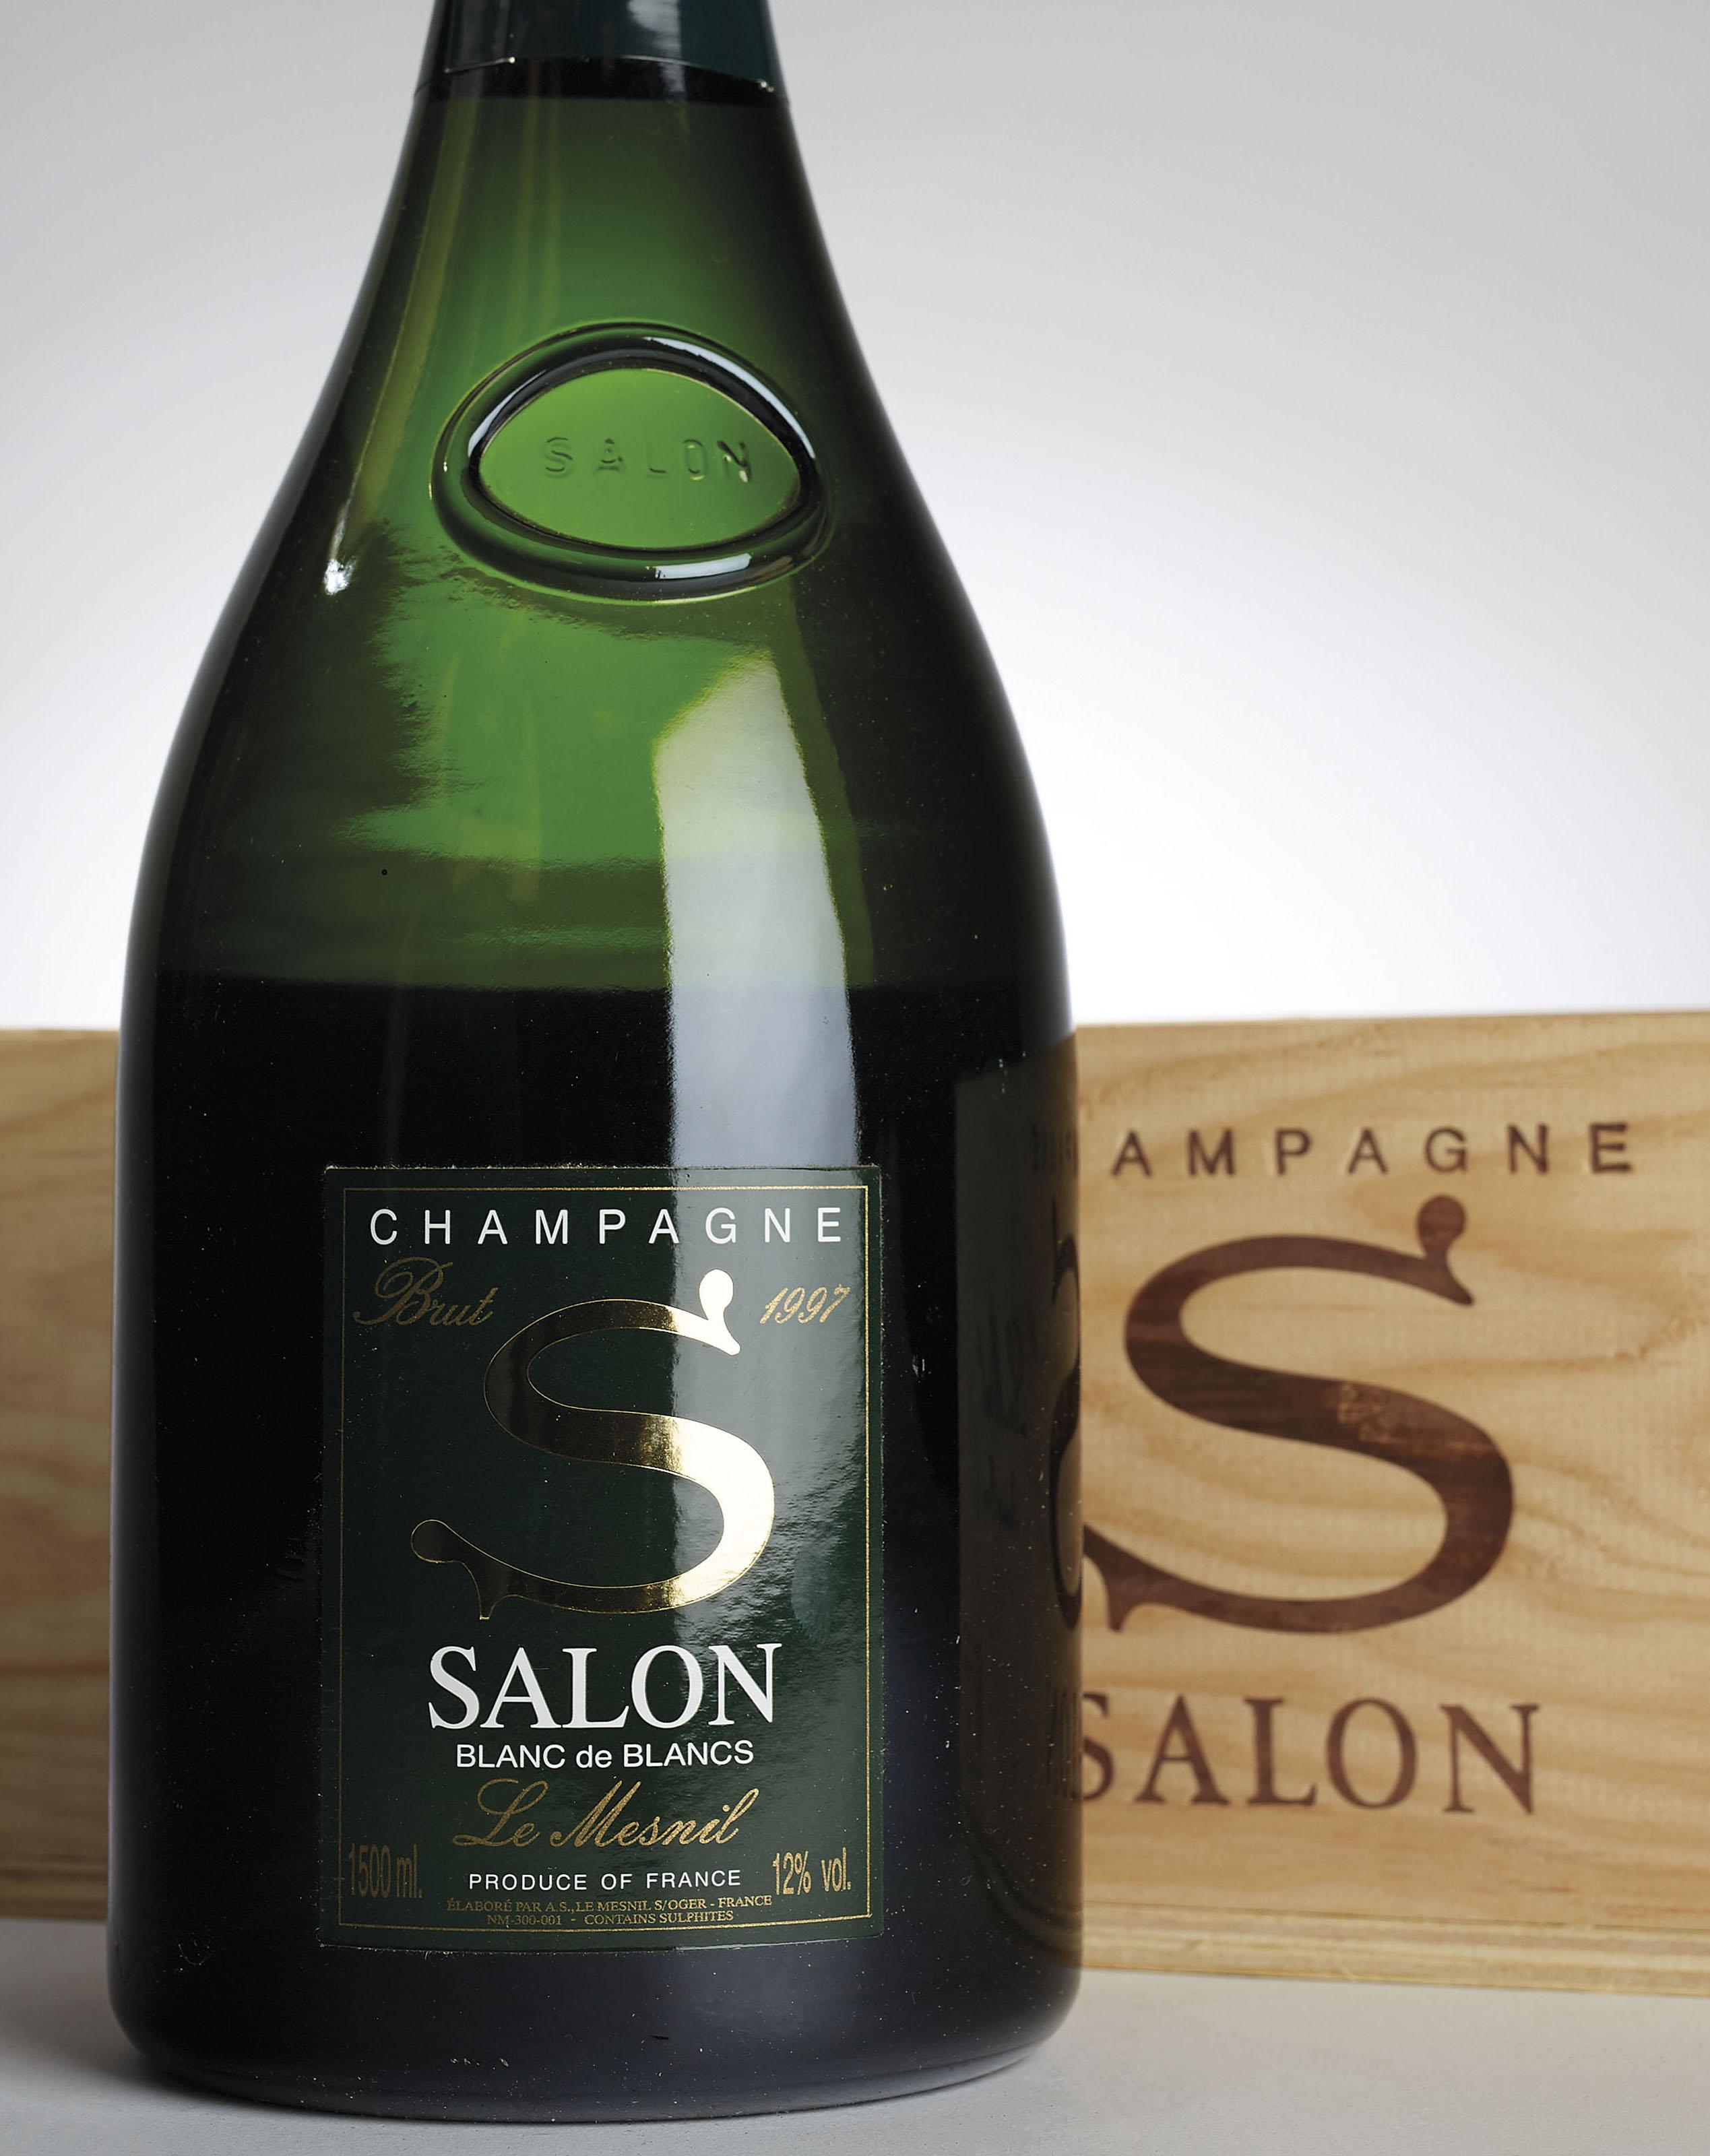 Salon Le Mesnil Blanc de Blancs 1997 | 6 bottles per lot ...